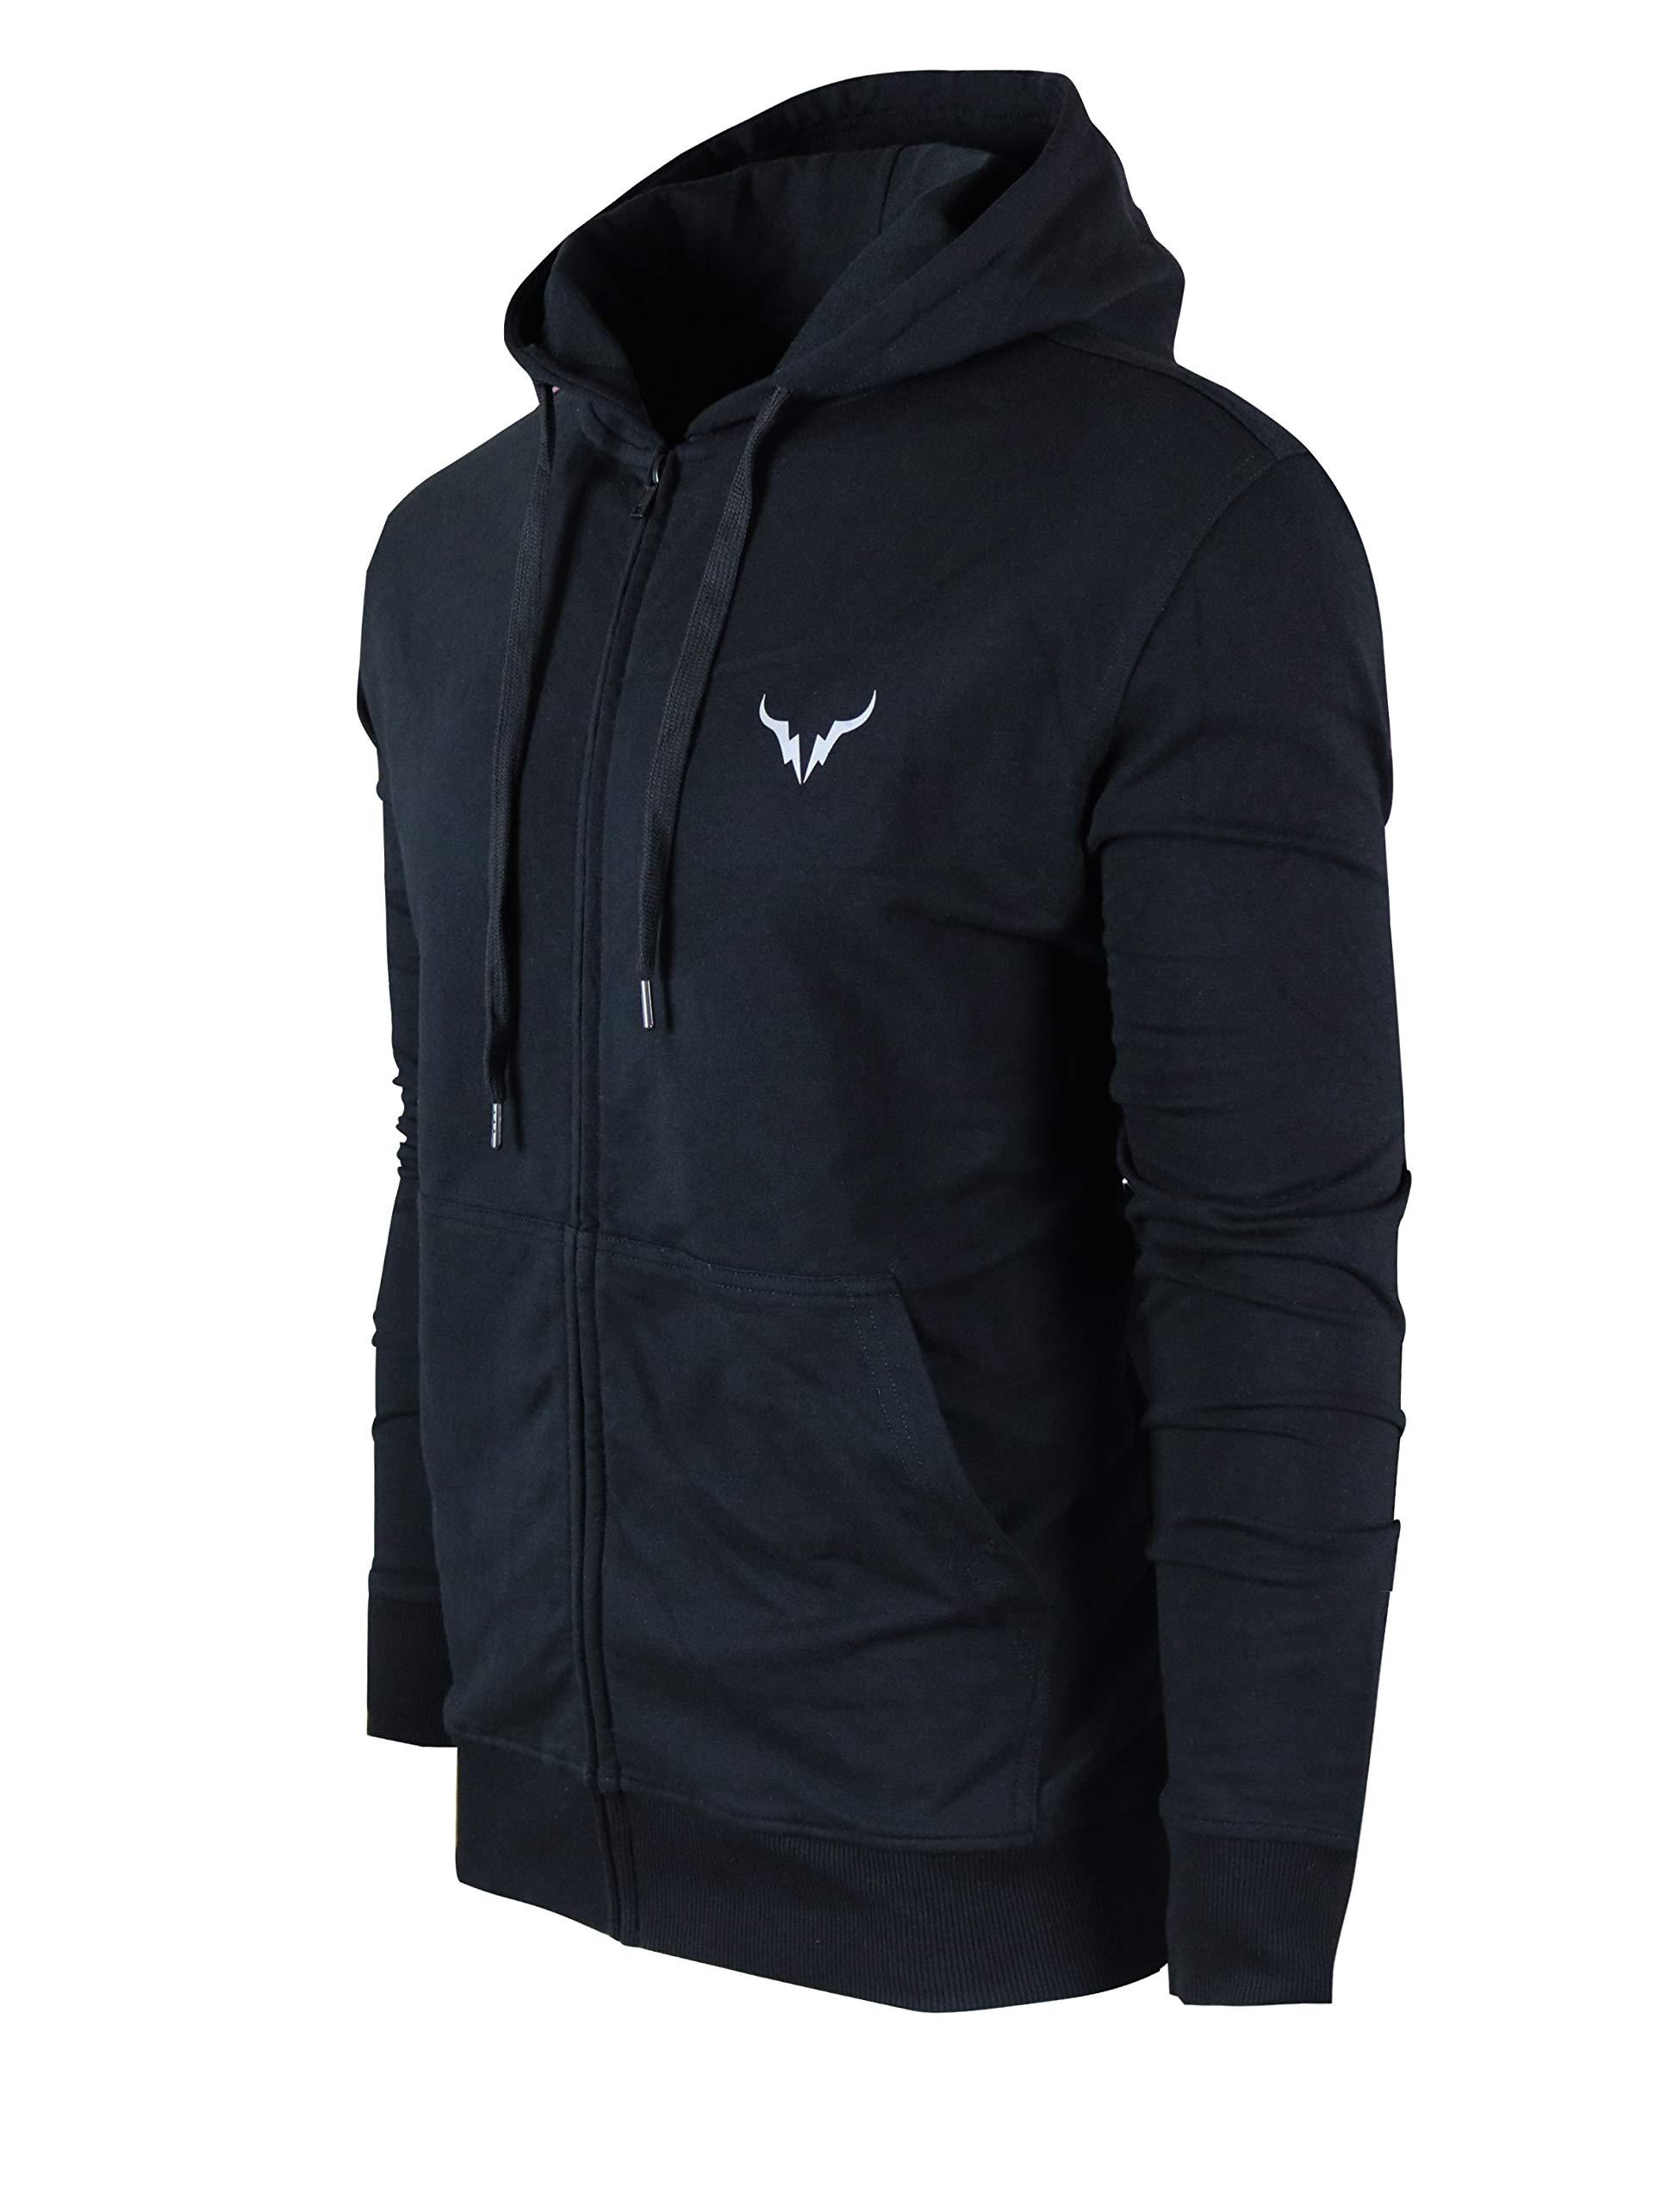 SCREENSHOT SPORTS-F11950 Mens Premium Athletic Zip-up Jacket - Running Fitness Jogger Workout Gym Sweatshirt-Black-Medium by SCREENSHOT